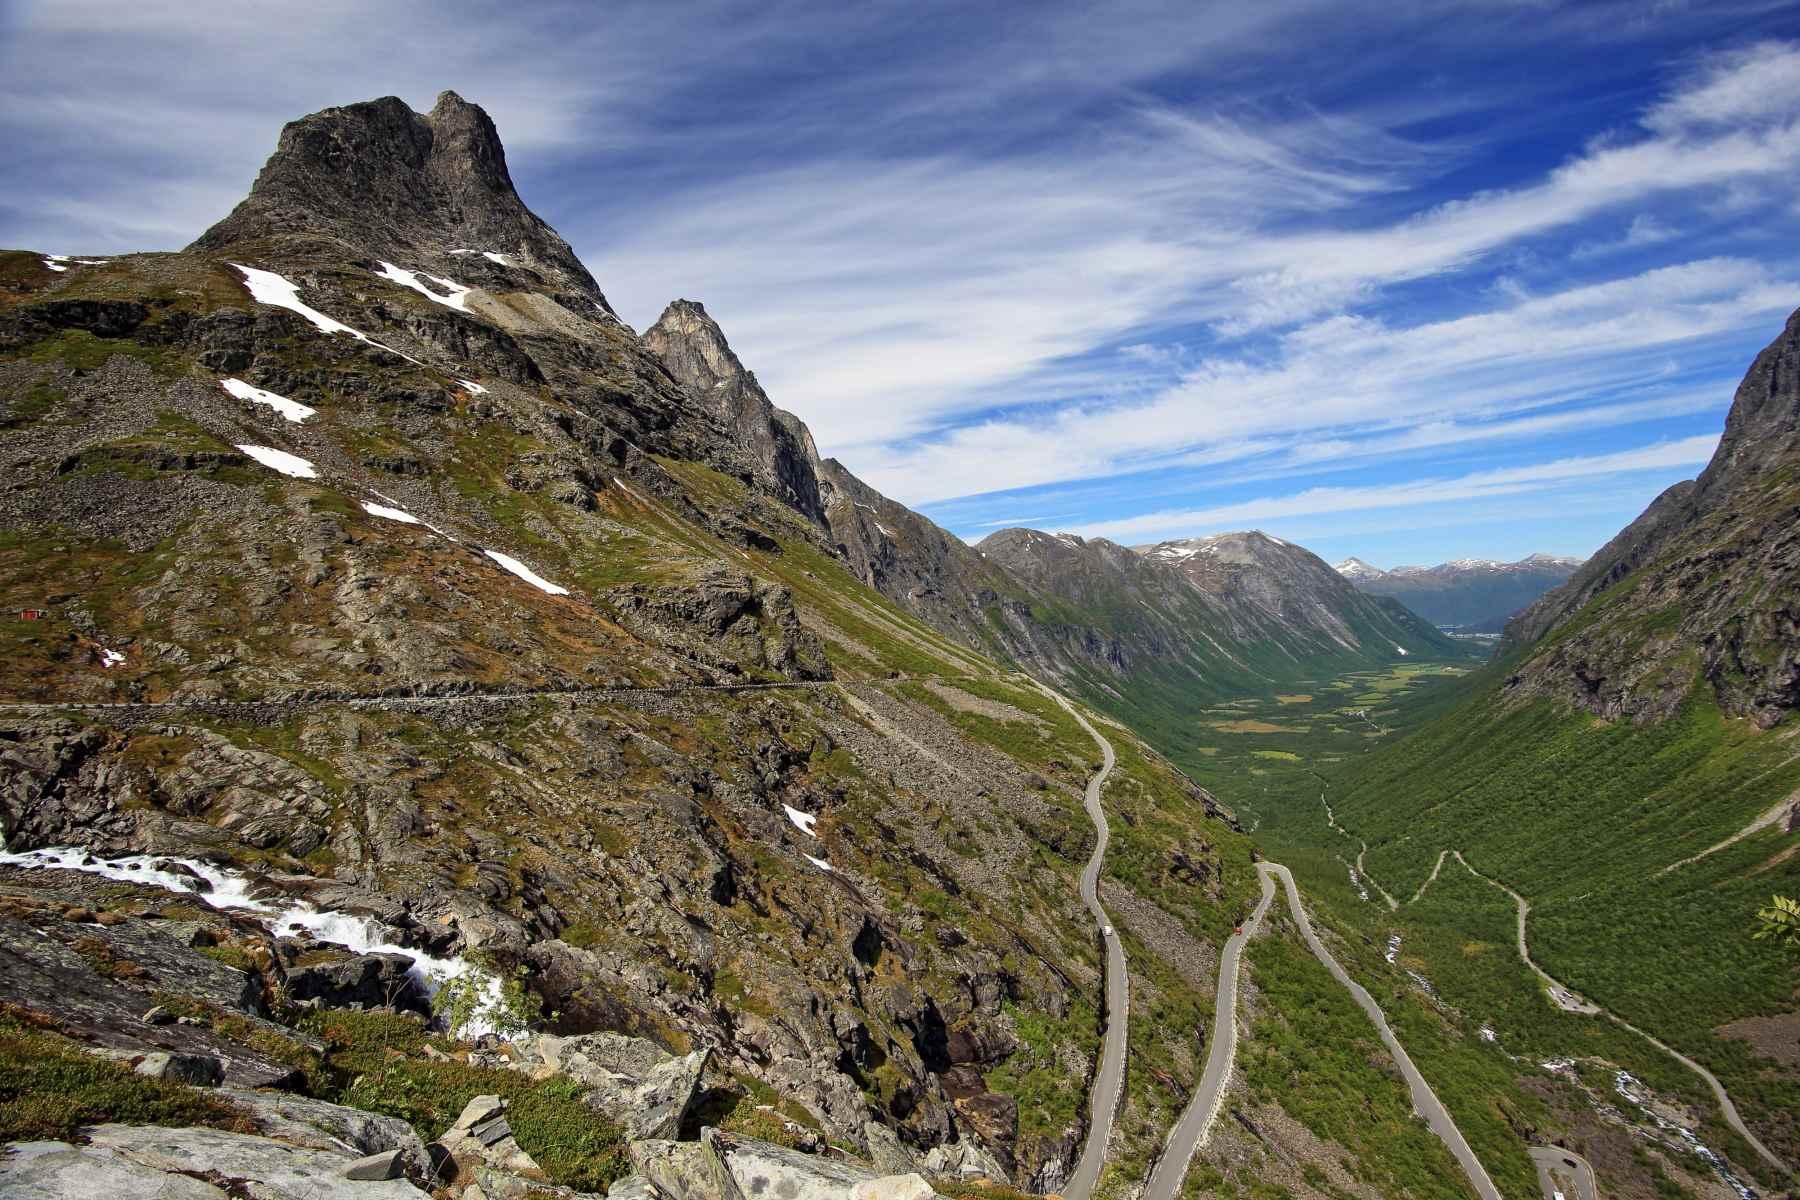 Trolove stopnice, legendarni cestni odsek